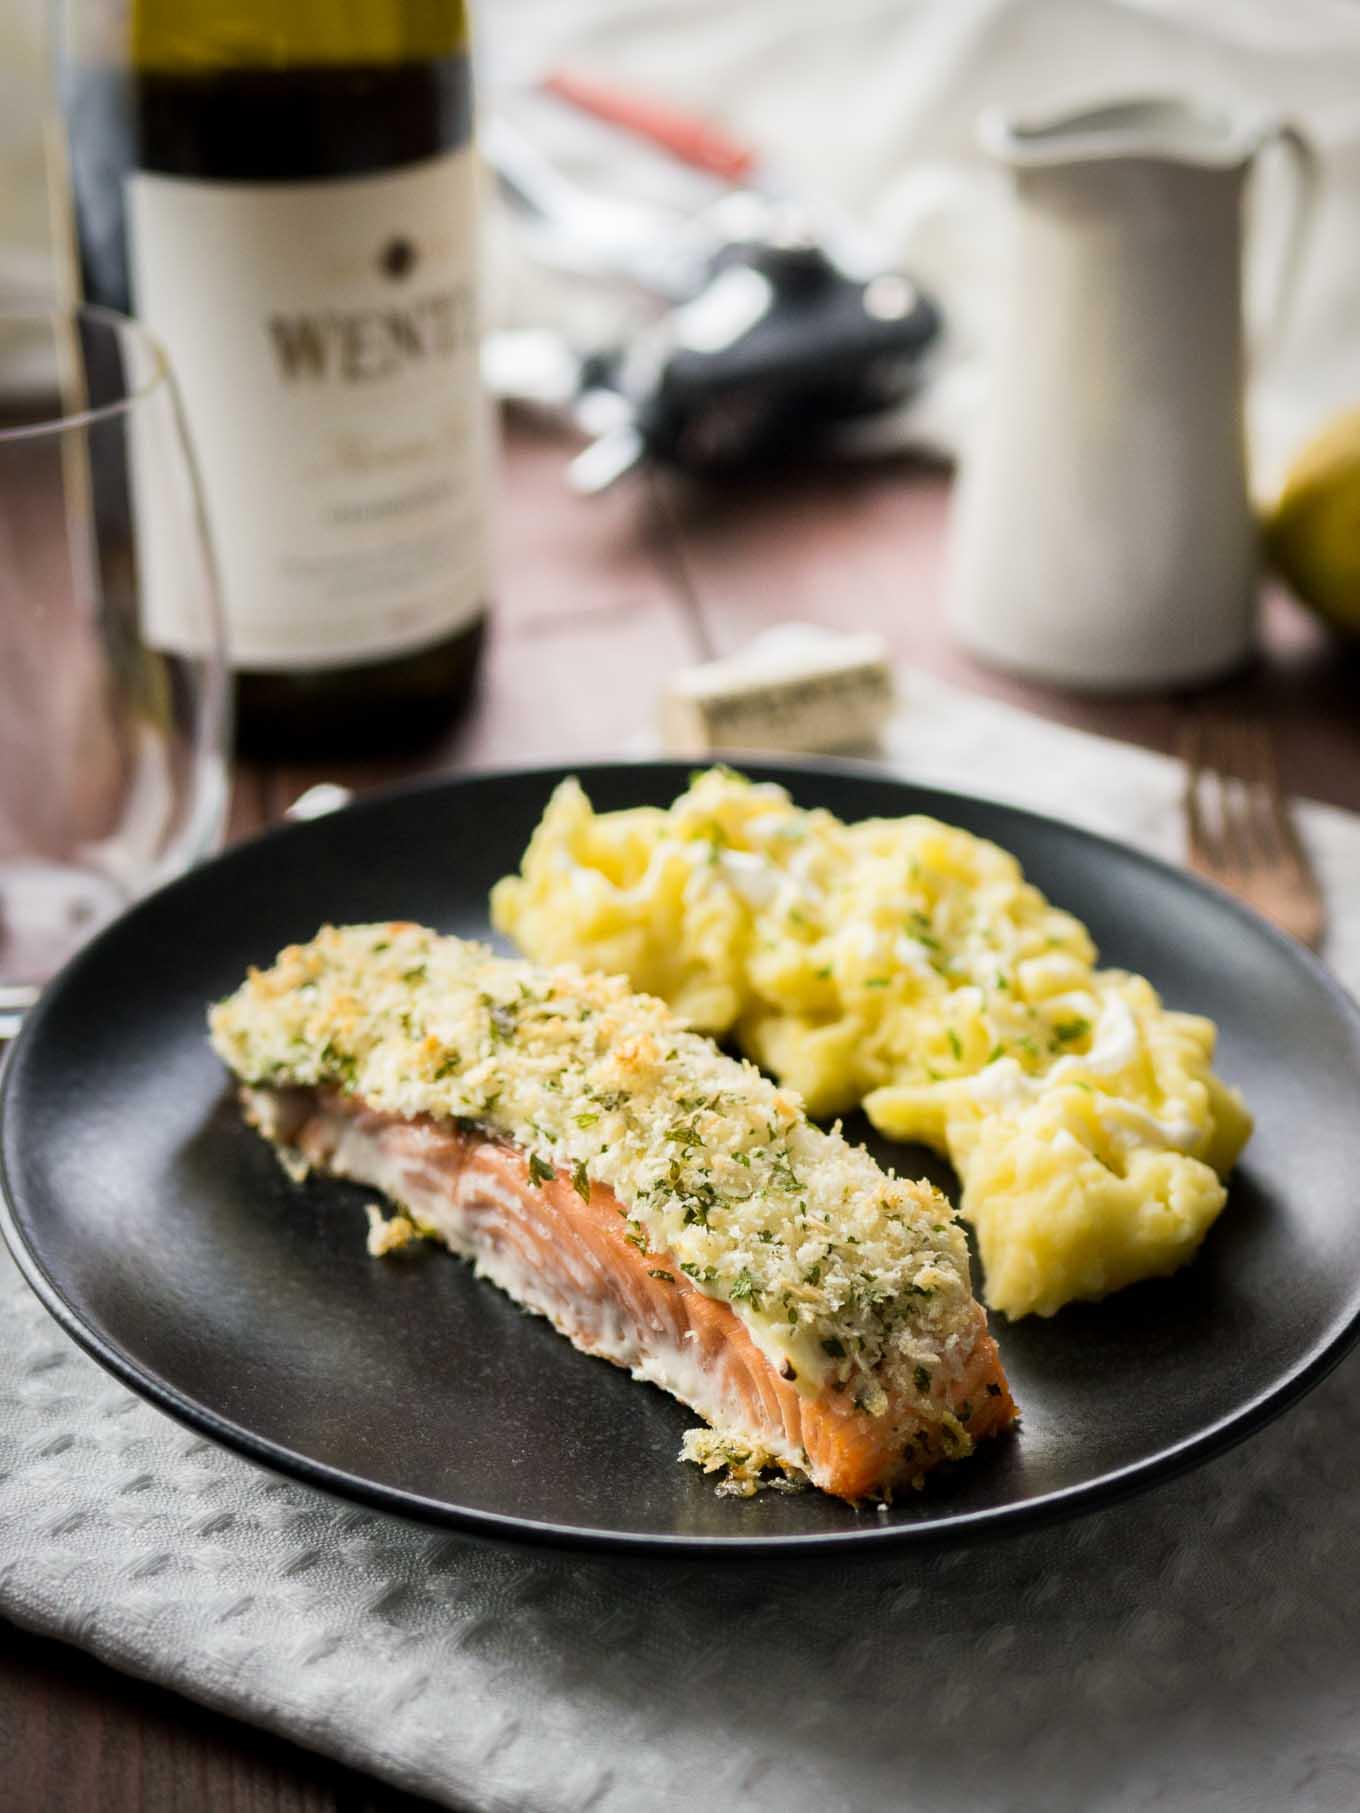 Horseradish-Parmesan-Crusted-Salmon-Plated-Cravings-3